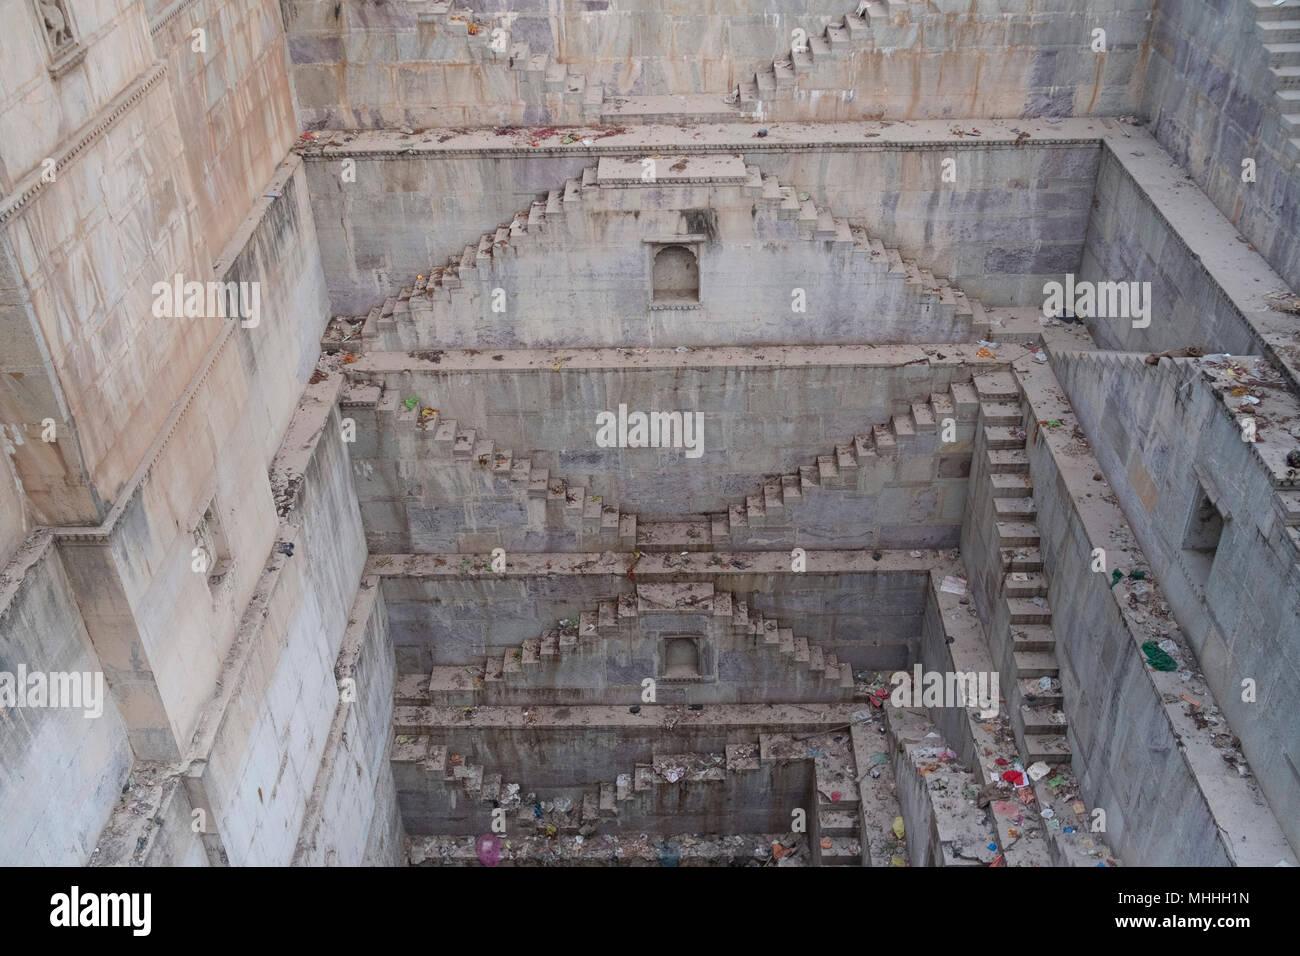 Nagar Sagar Kund Stepwell. Bundi, Rajasthan, India - Stock Image